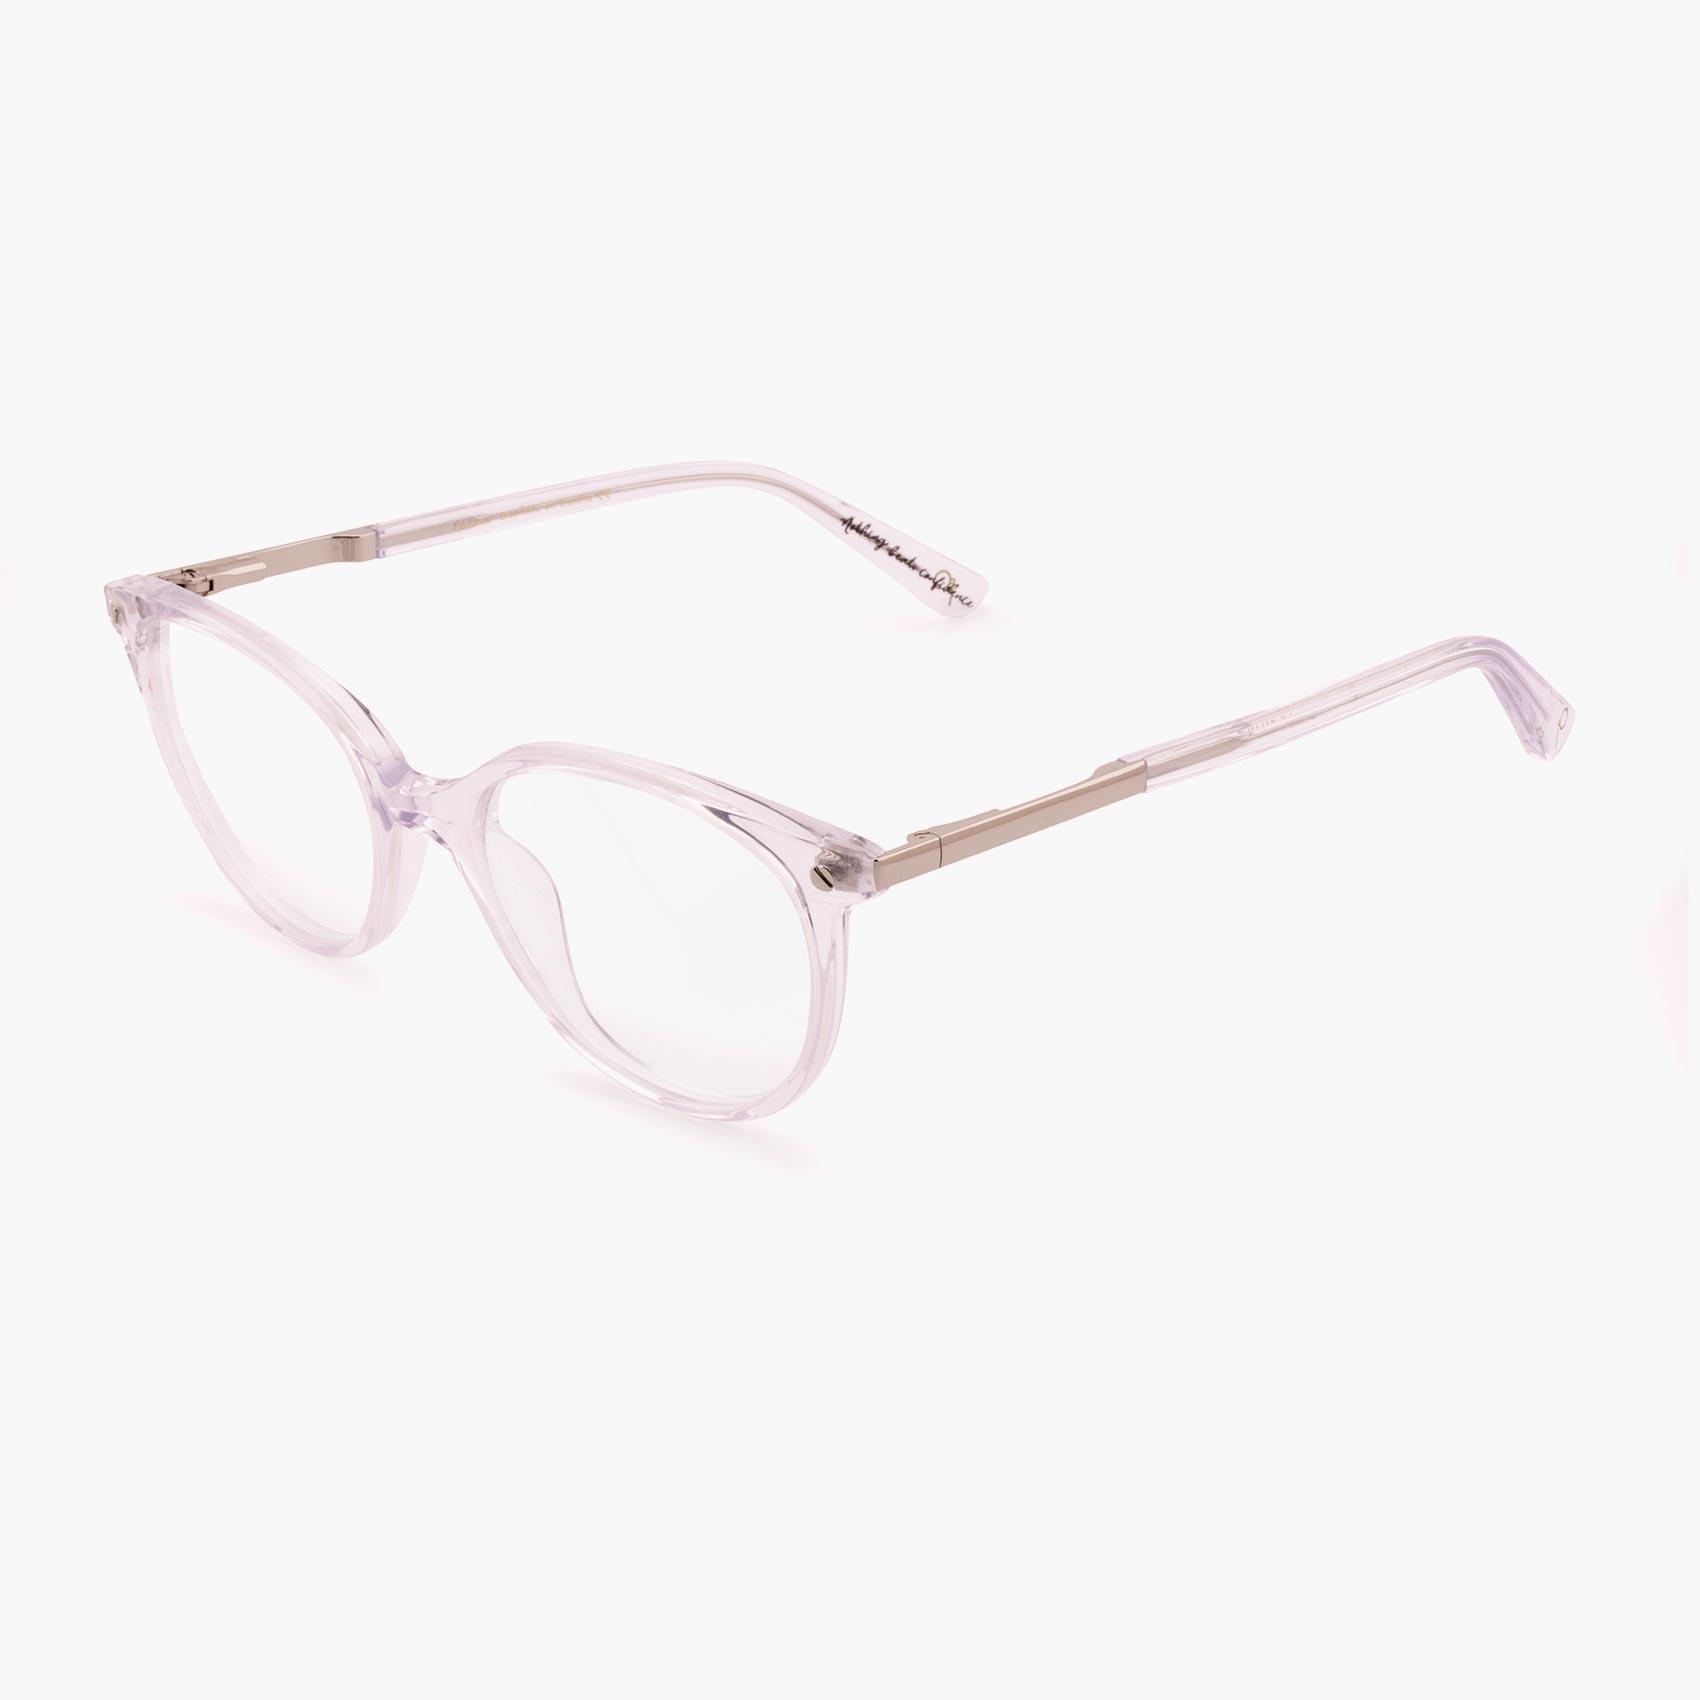 Proud eyewear Charlize C4 P gafas de vista mujer transparentes